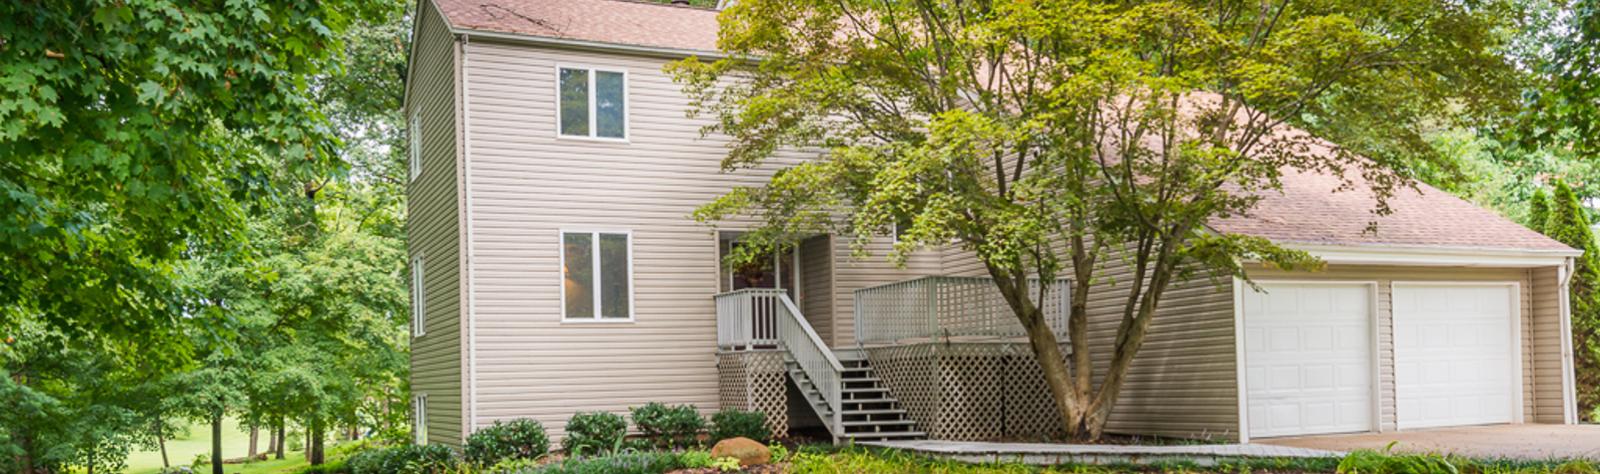 1060 Centerbrook Circle-Patti-Burton-Blue-Ridge-Properties-slide